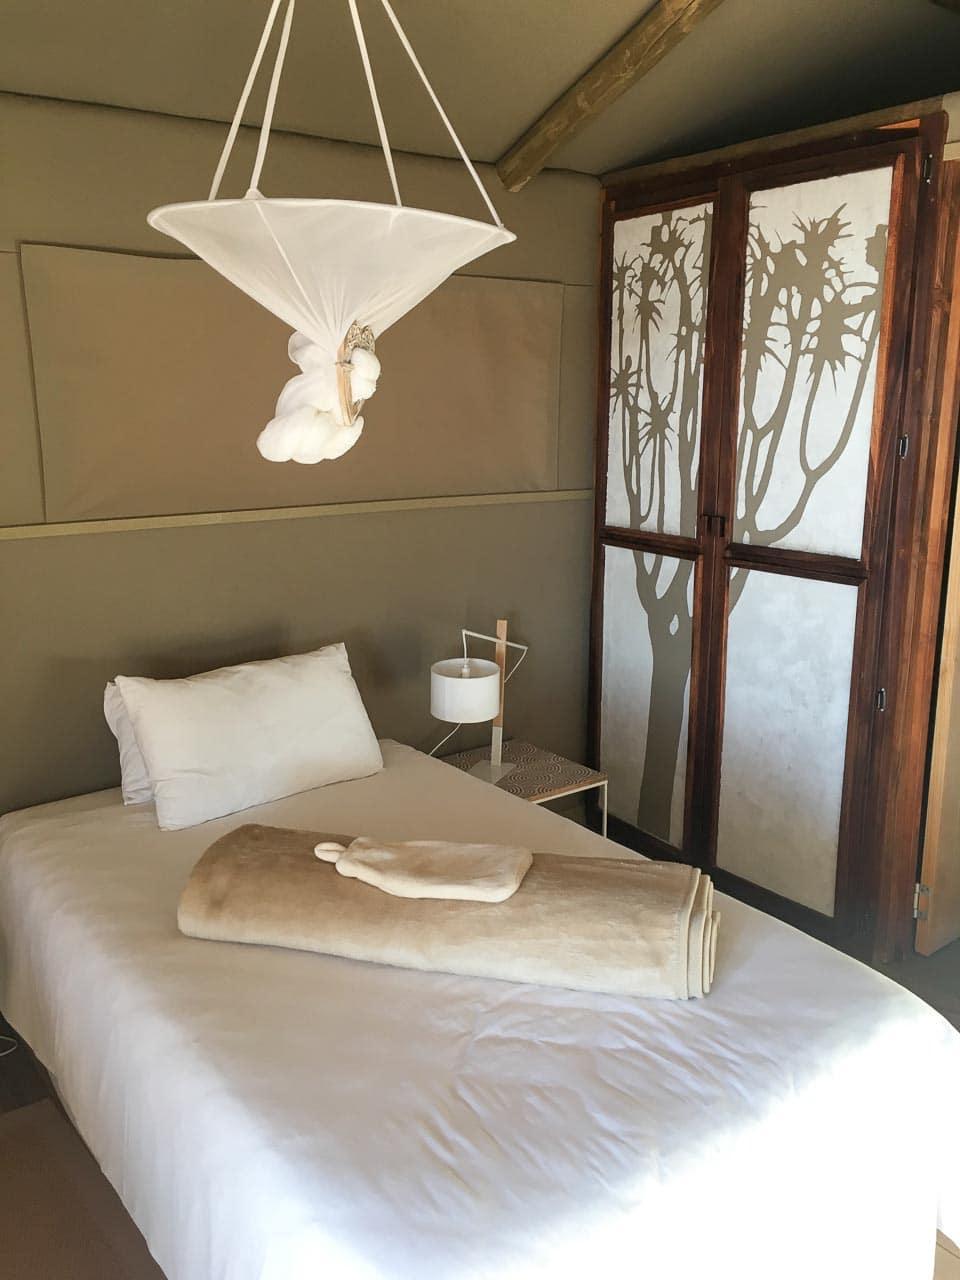 Kanaan-Desert-Retreat-Namibia-Globetrotter-Select-2